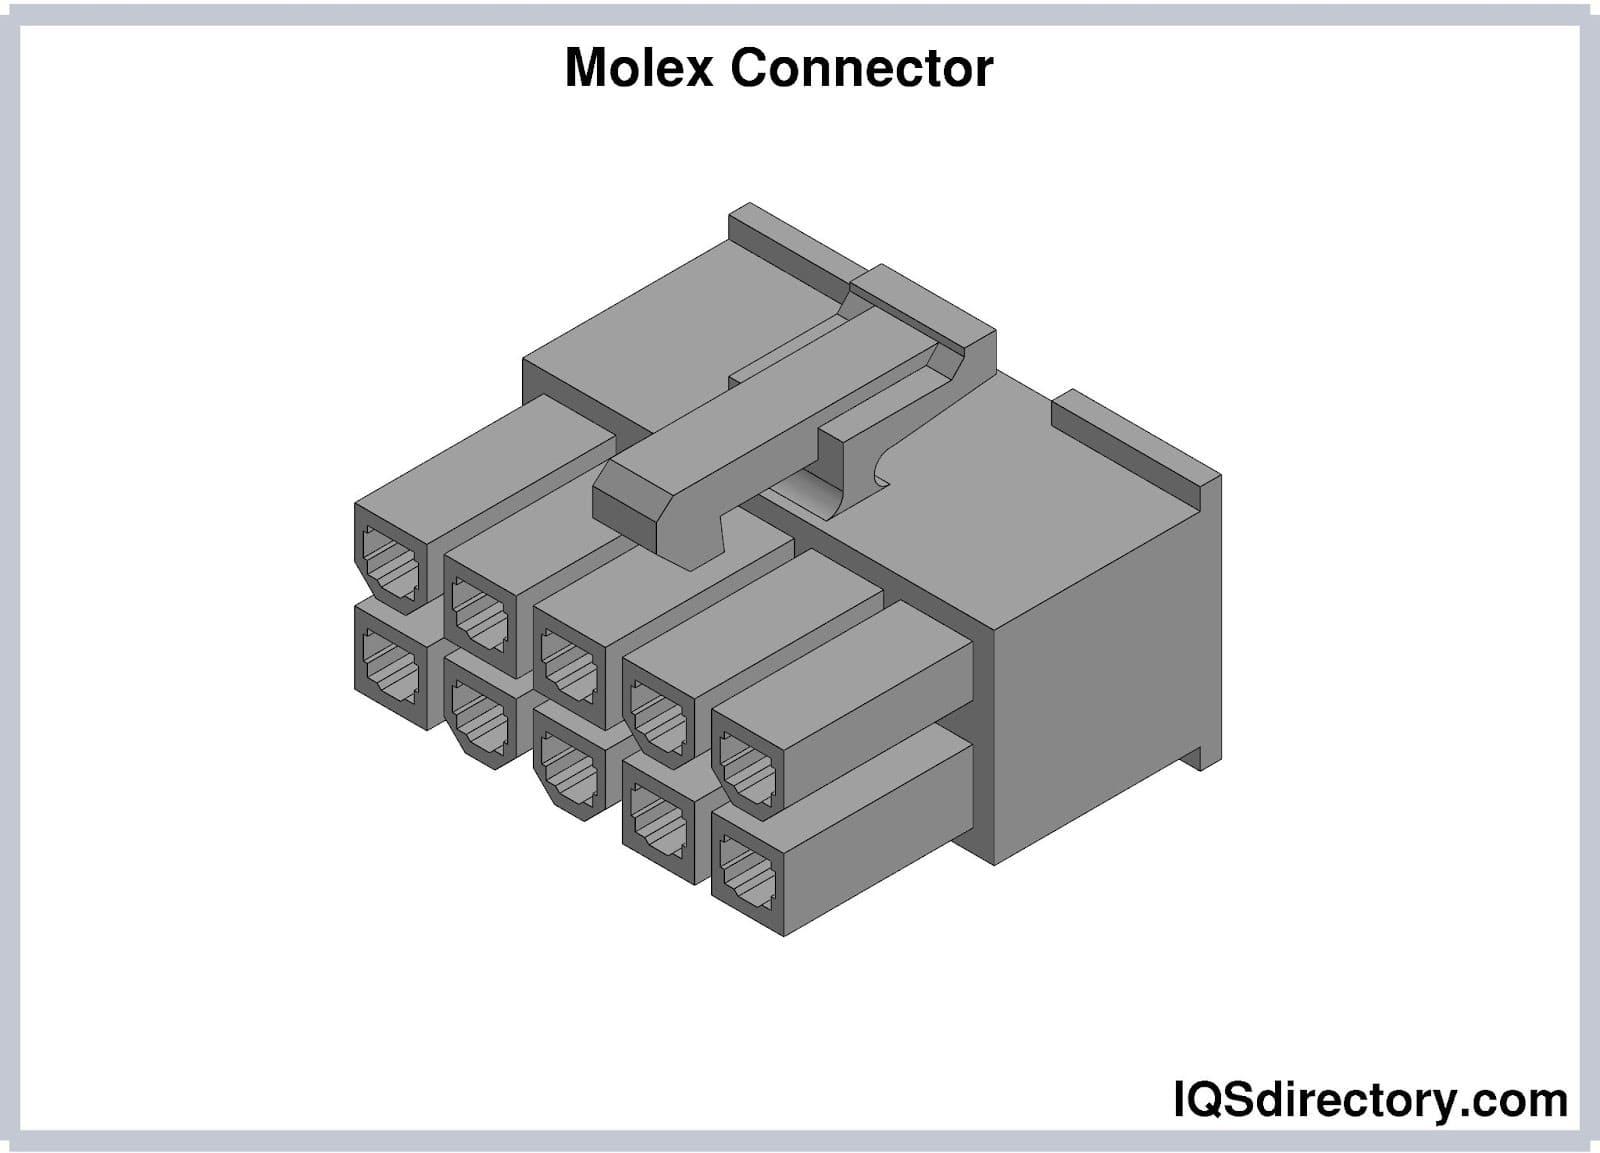 Molex Connector